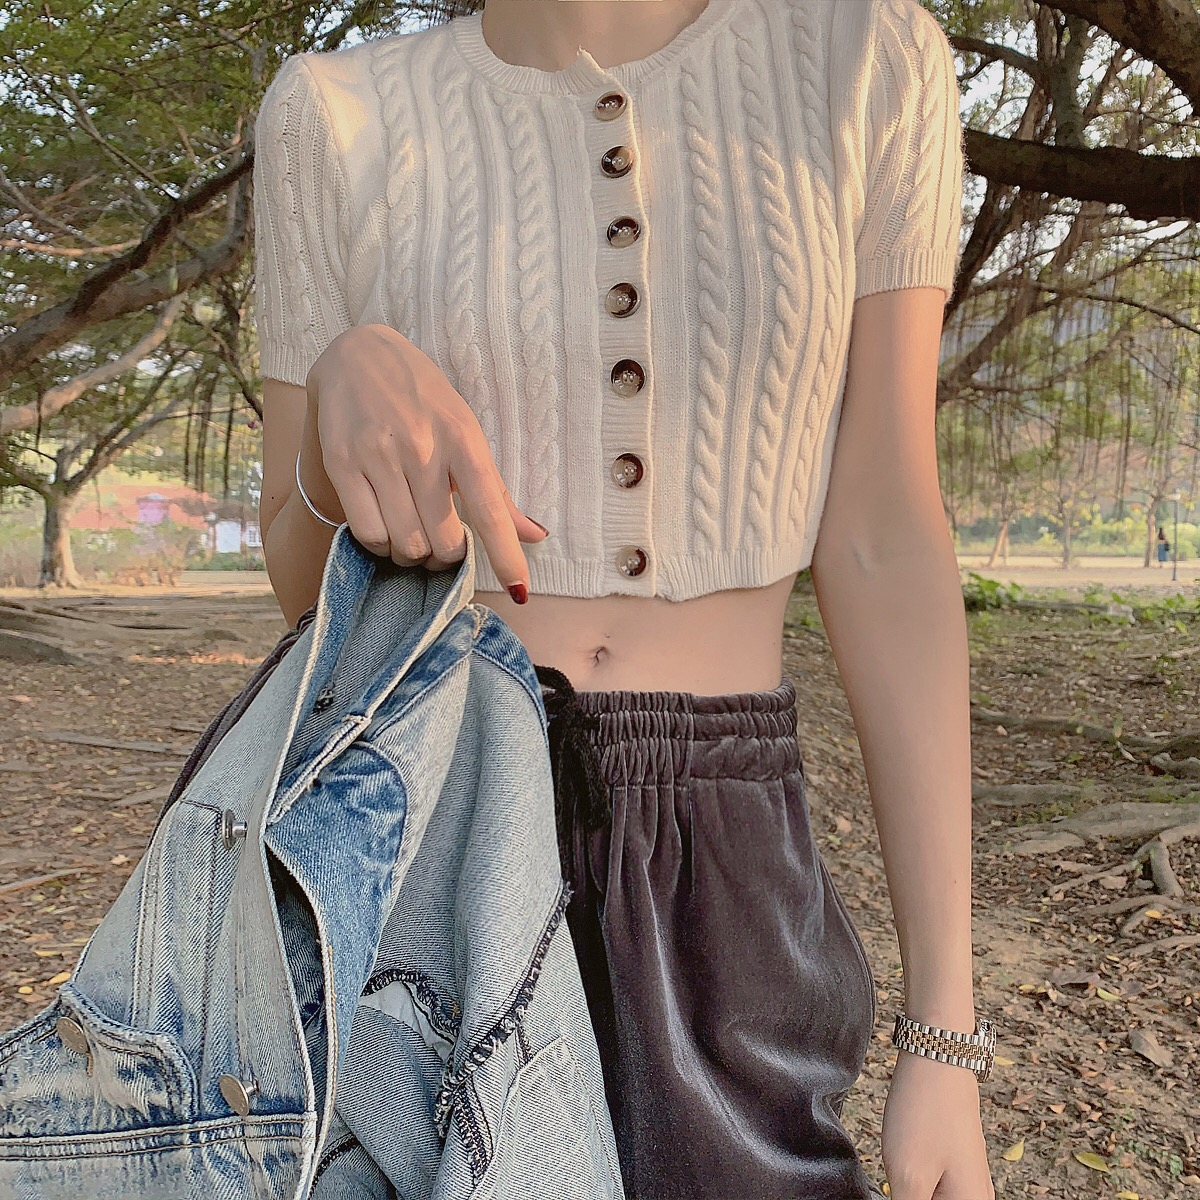 AKSHOP短袖高腰毛衣白色女麻花2020套头港味小款短款修身春装T恤